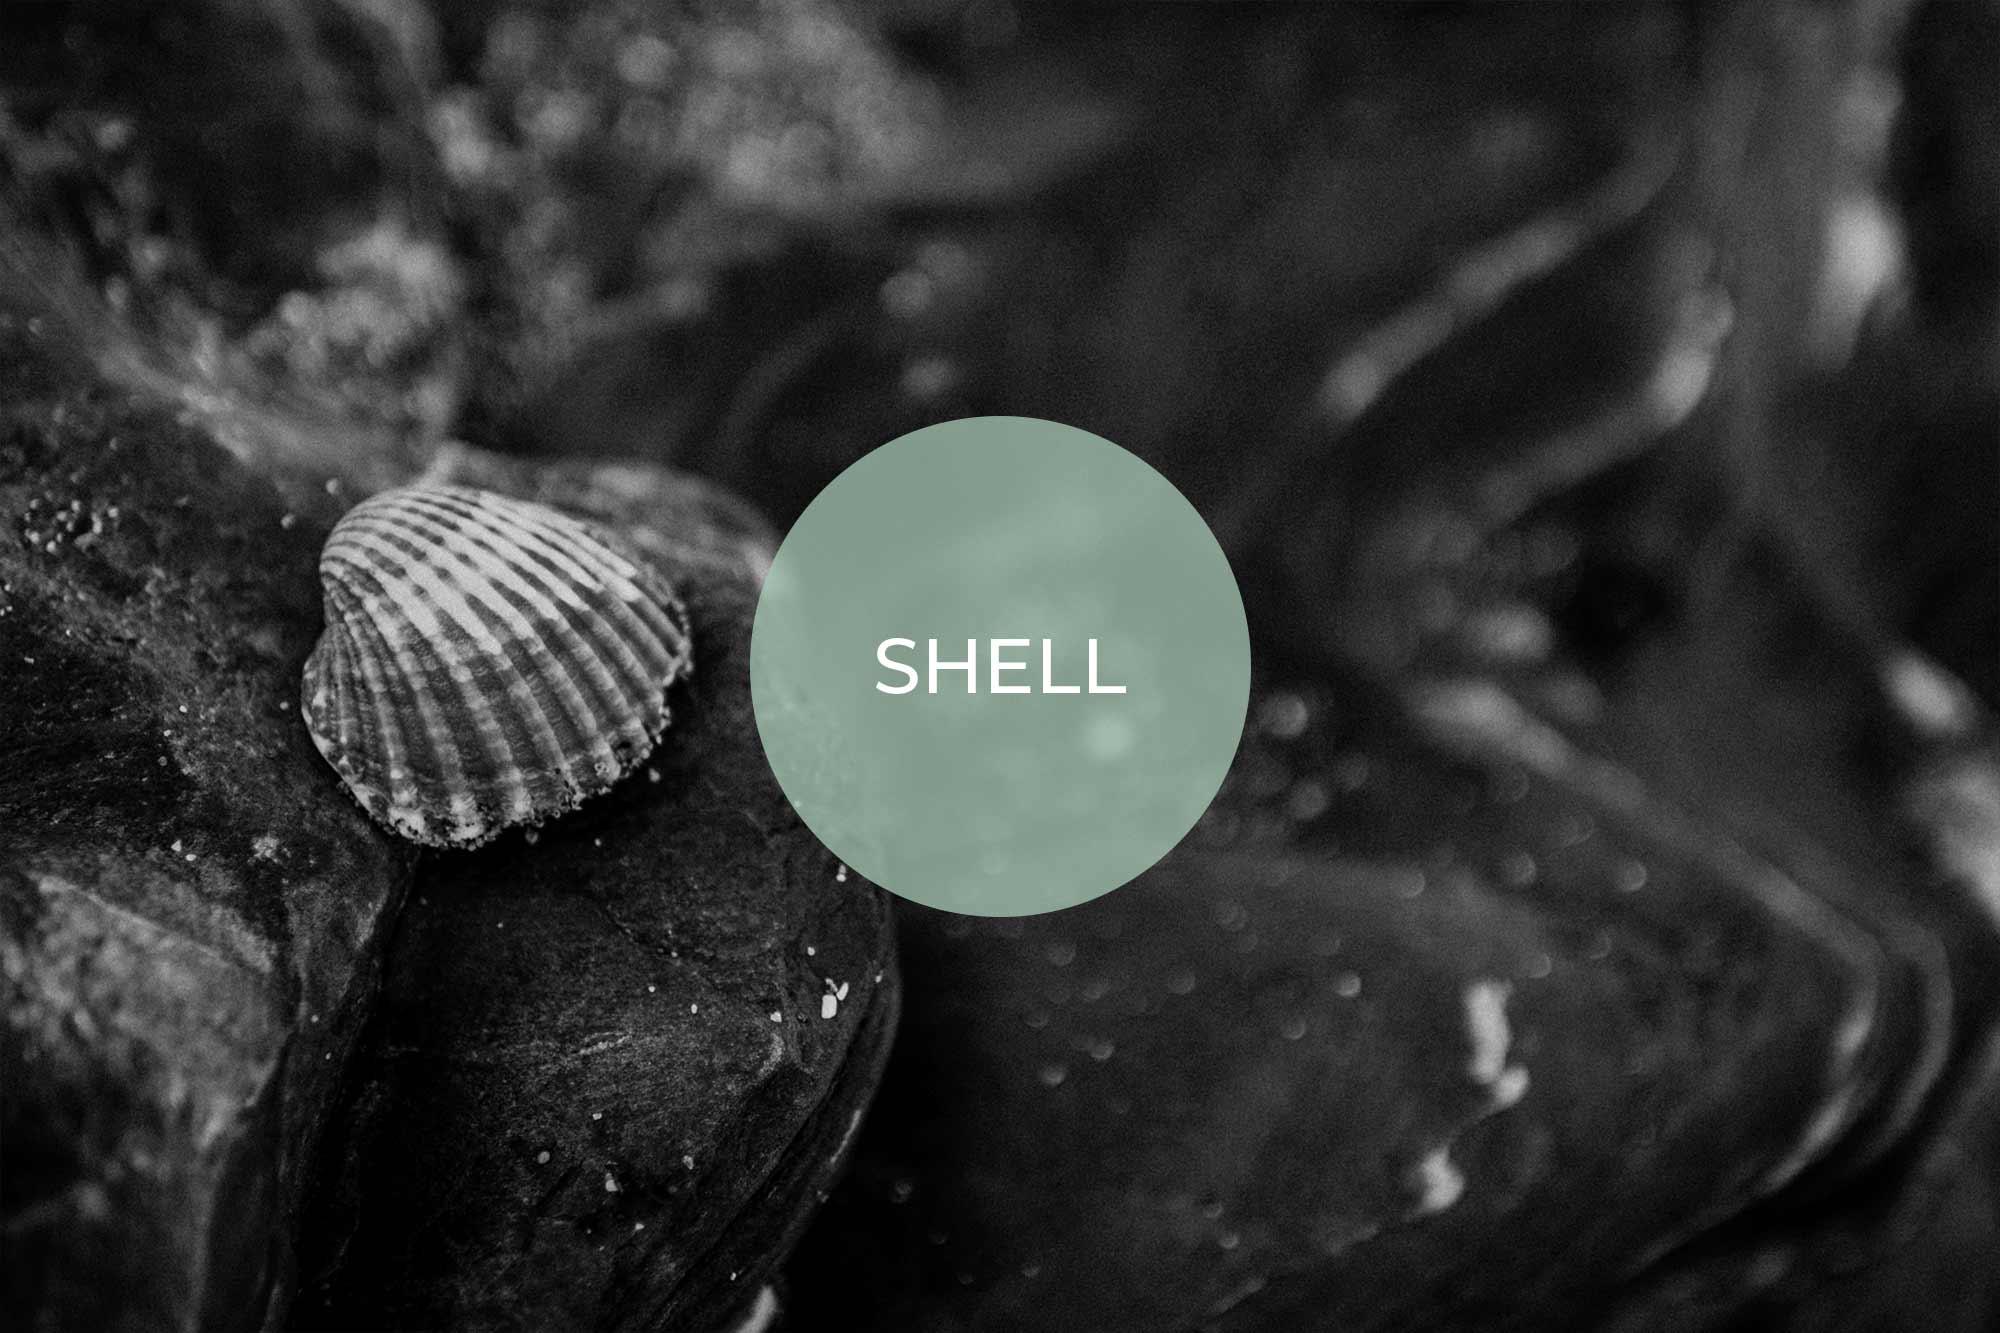 shell its vegan made